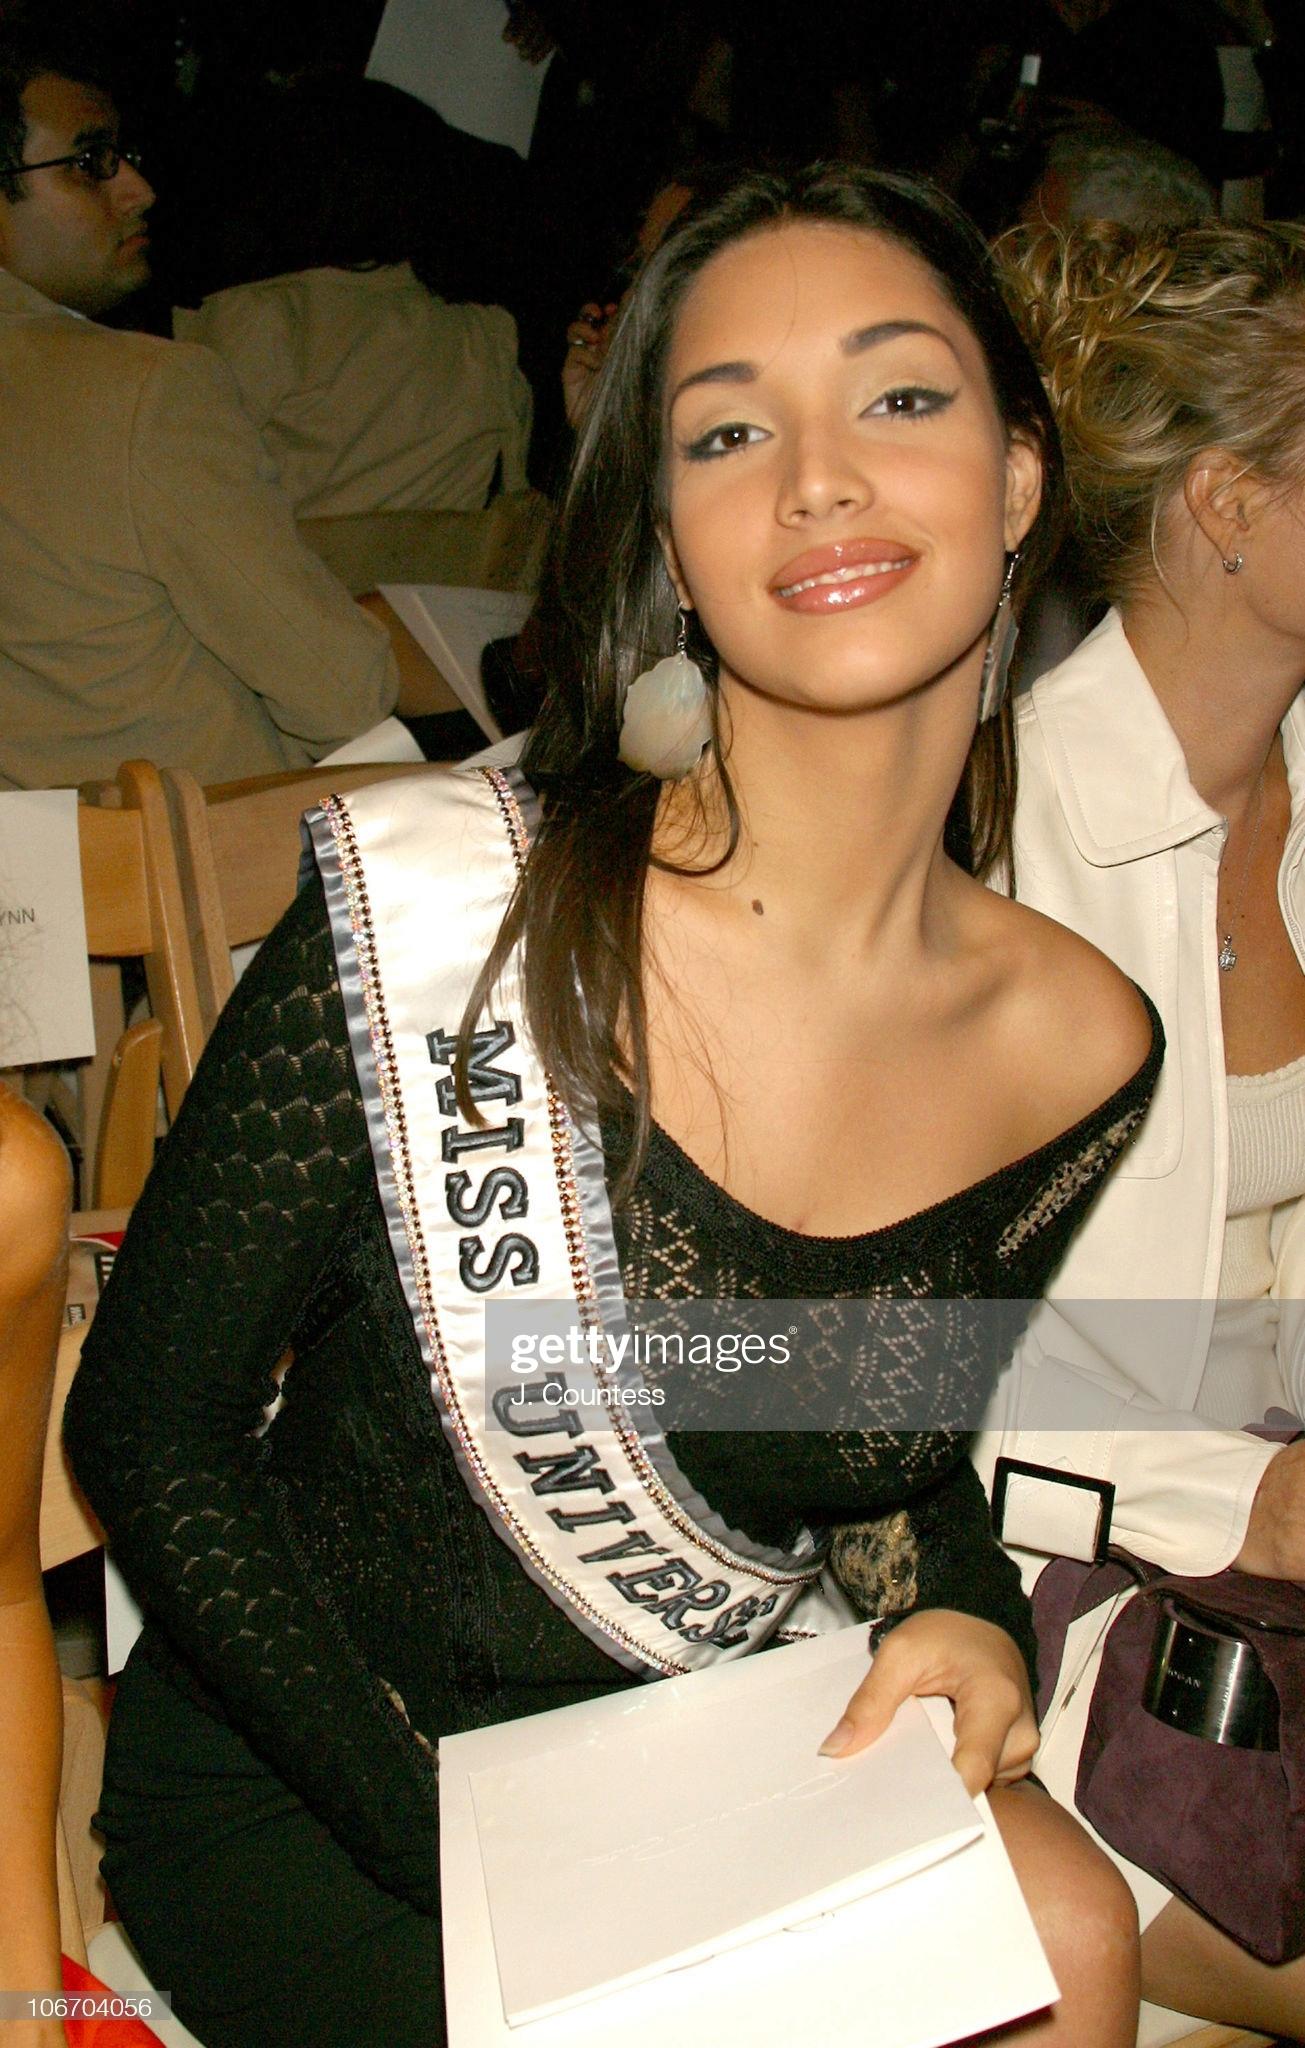 ════ ∘◦❁◦∘ ════ Amelia Vega, Miss Universe 2003. ════ ∘◦❁◦∘ ════ - Página 14 23356715